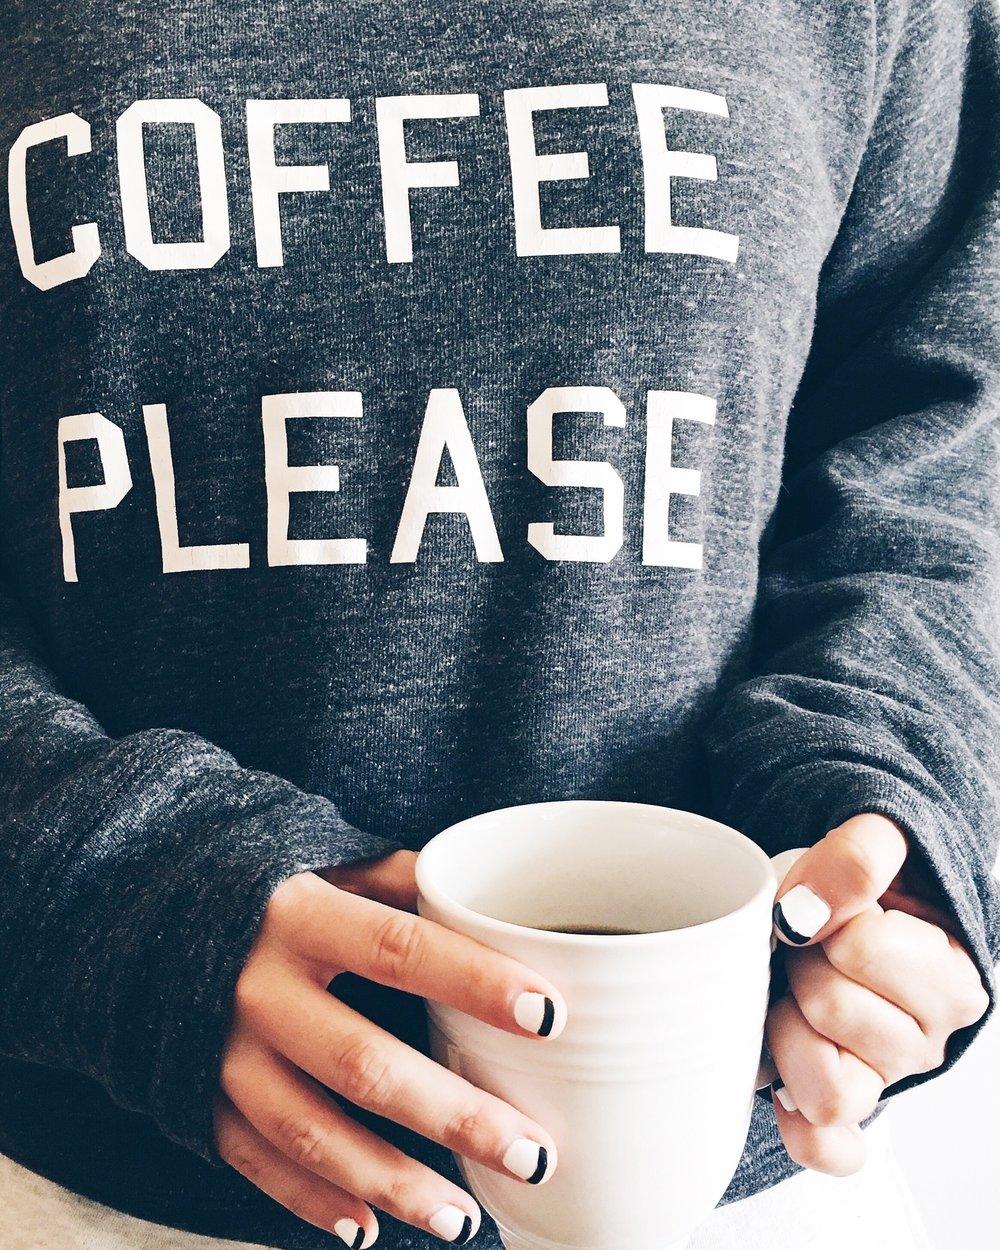 topshelfcoffee.jpg